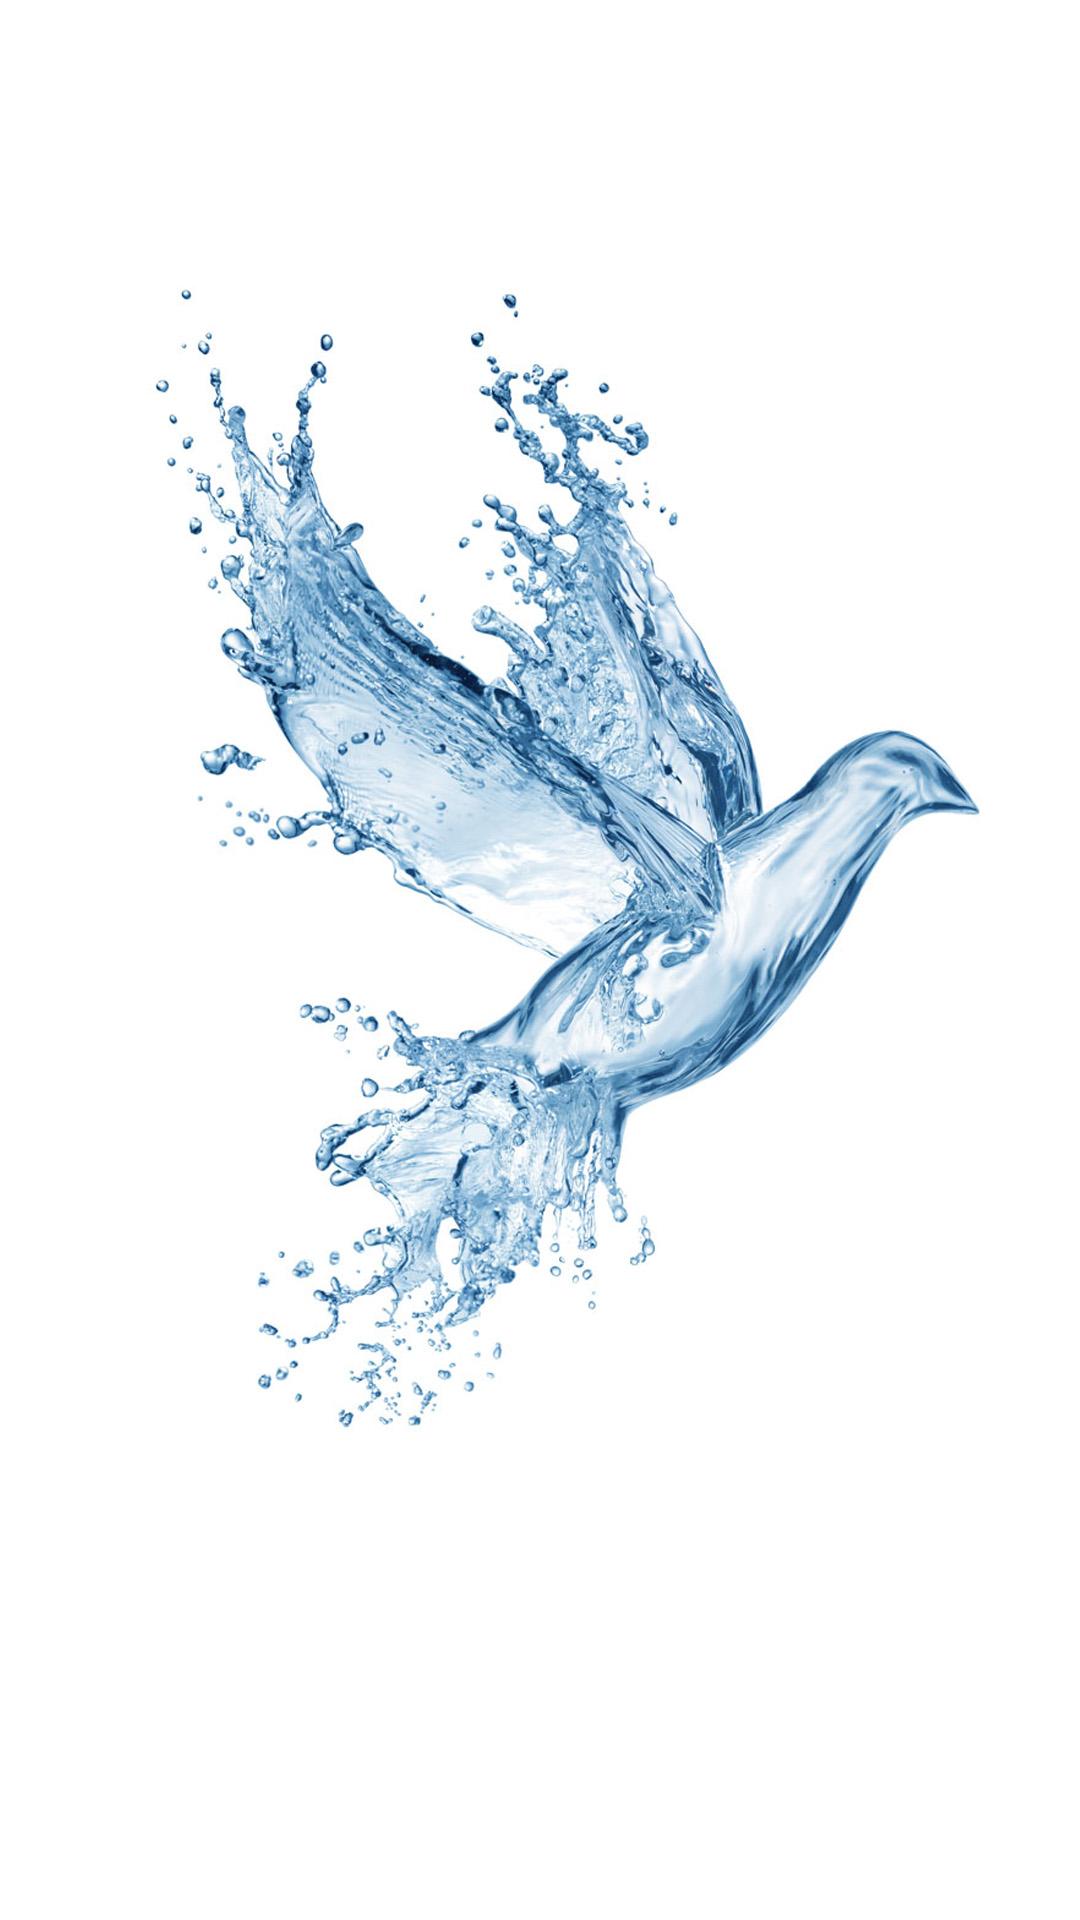 To download click on Water Splash Bird Wallpaper then choose save 1080x1920